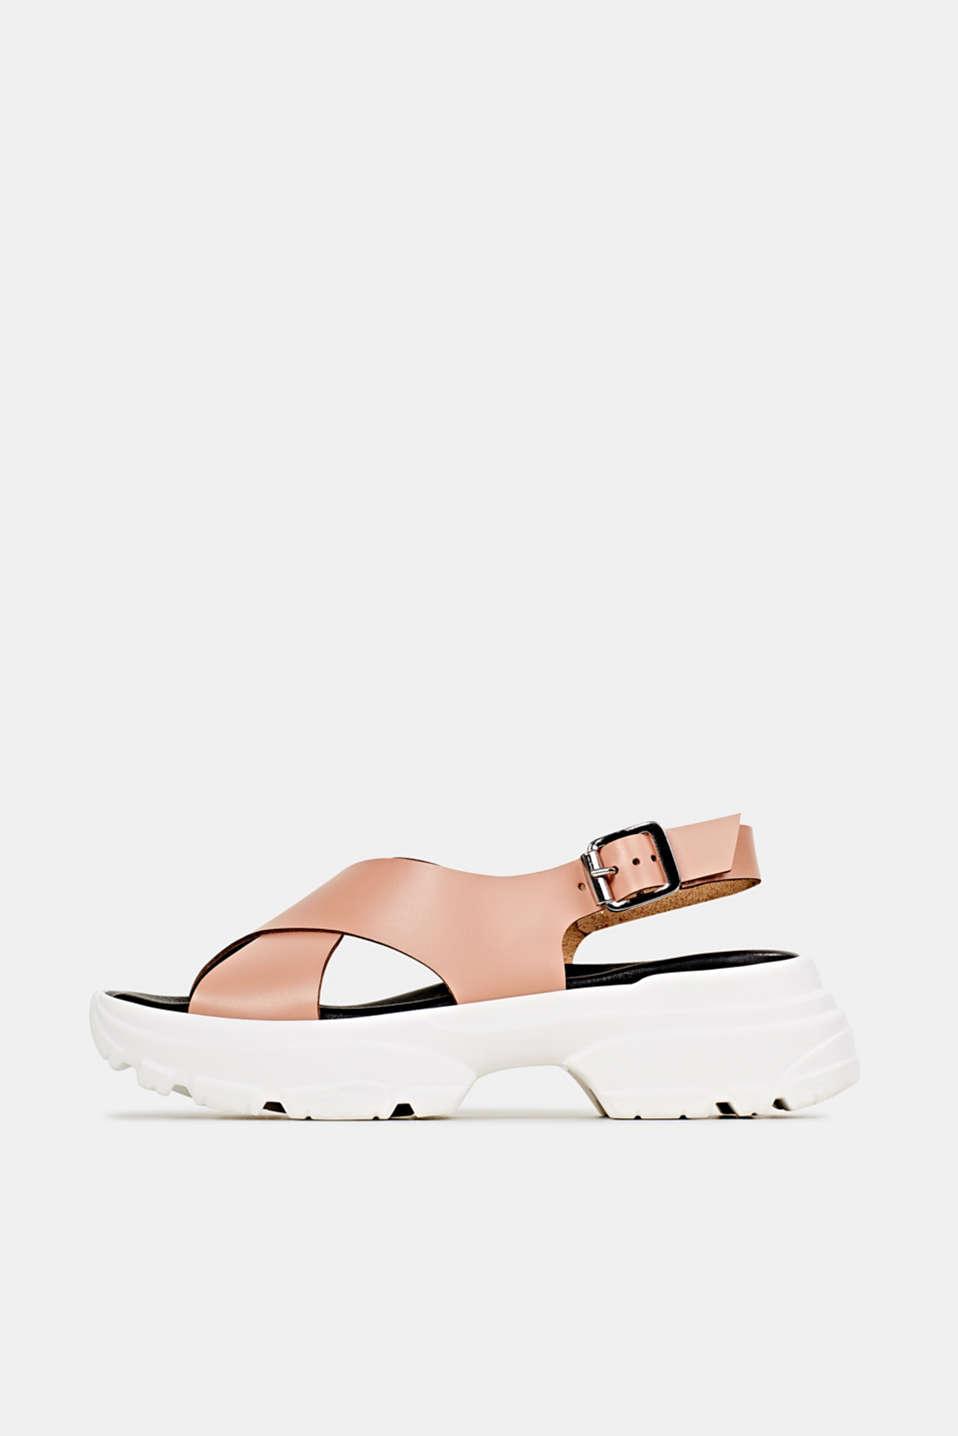 Leather trainer sandals, BLUSH, detail image number 0